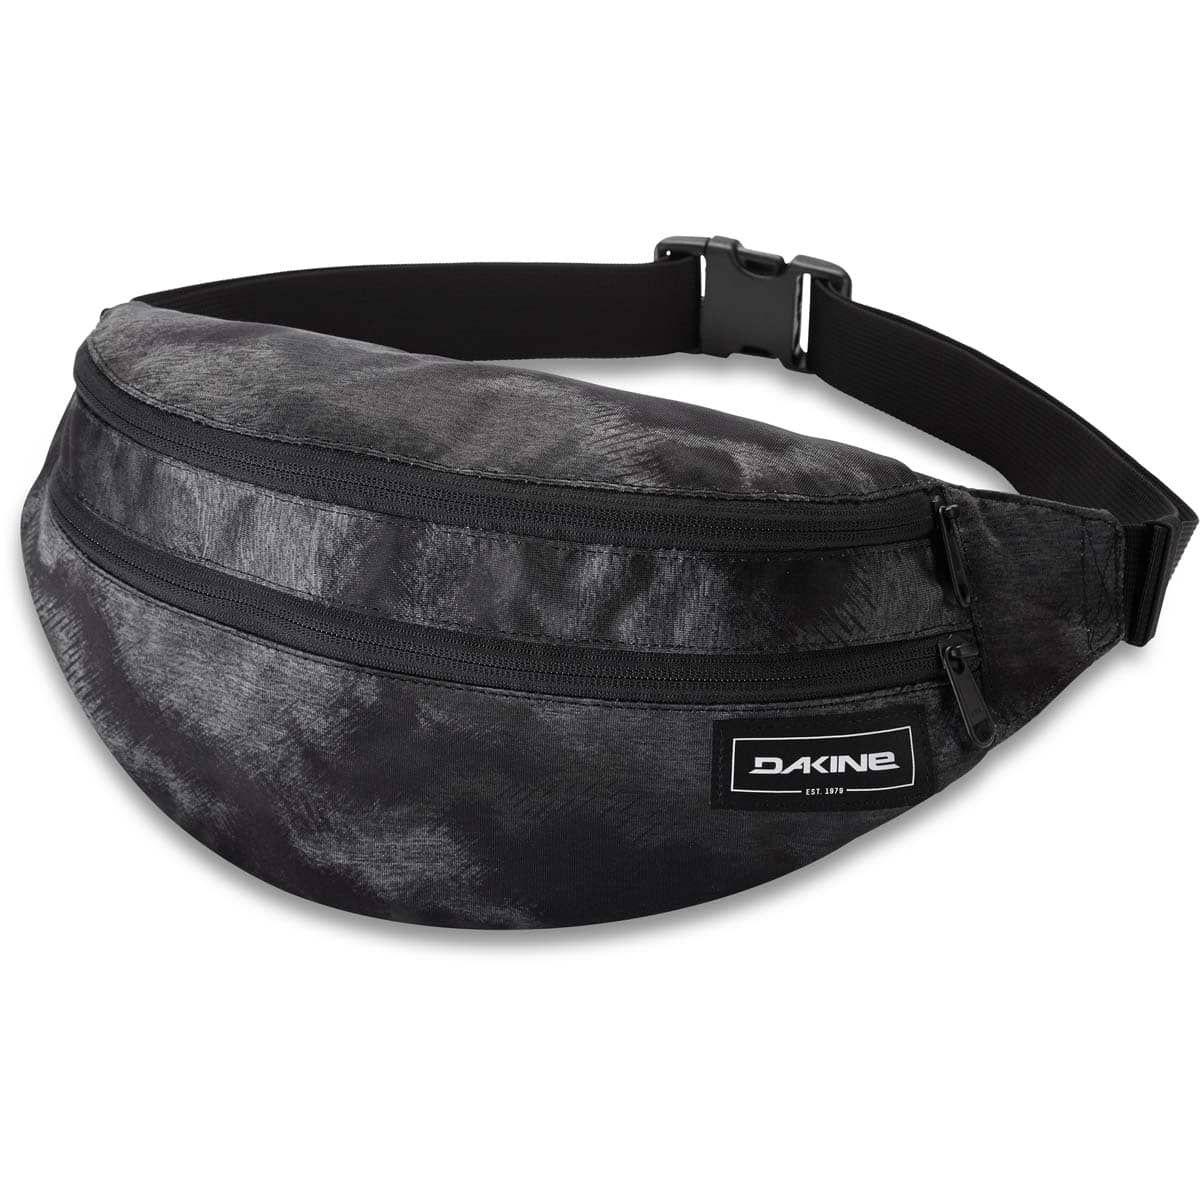 Dakine Classic Hip Pack Large Ashcroft Black Jersey